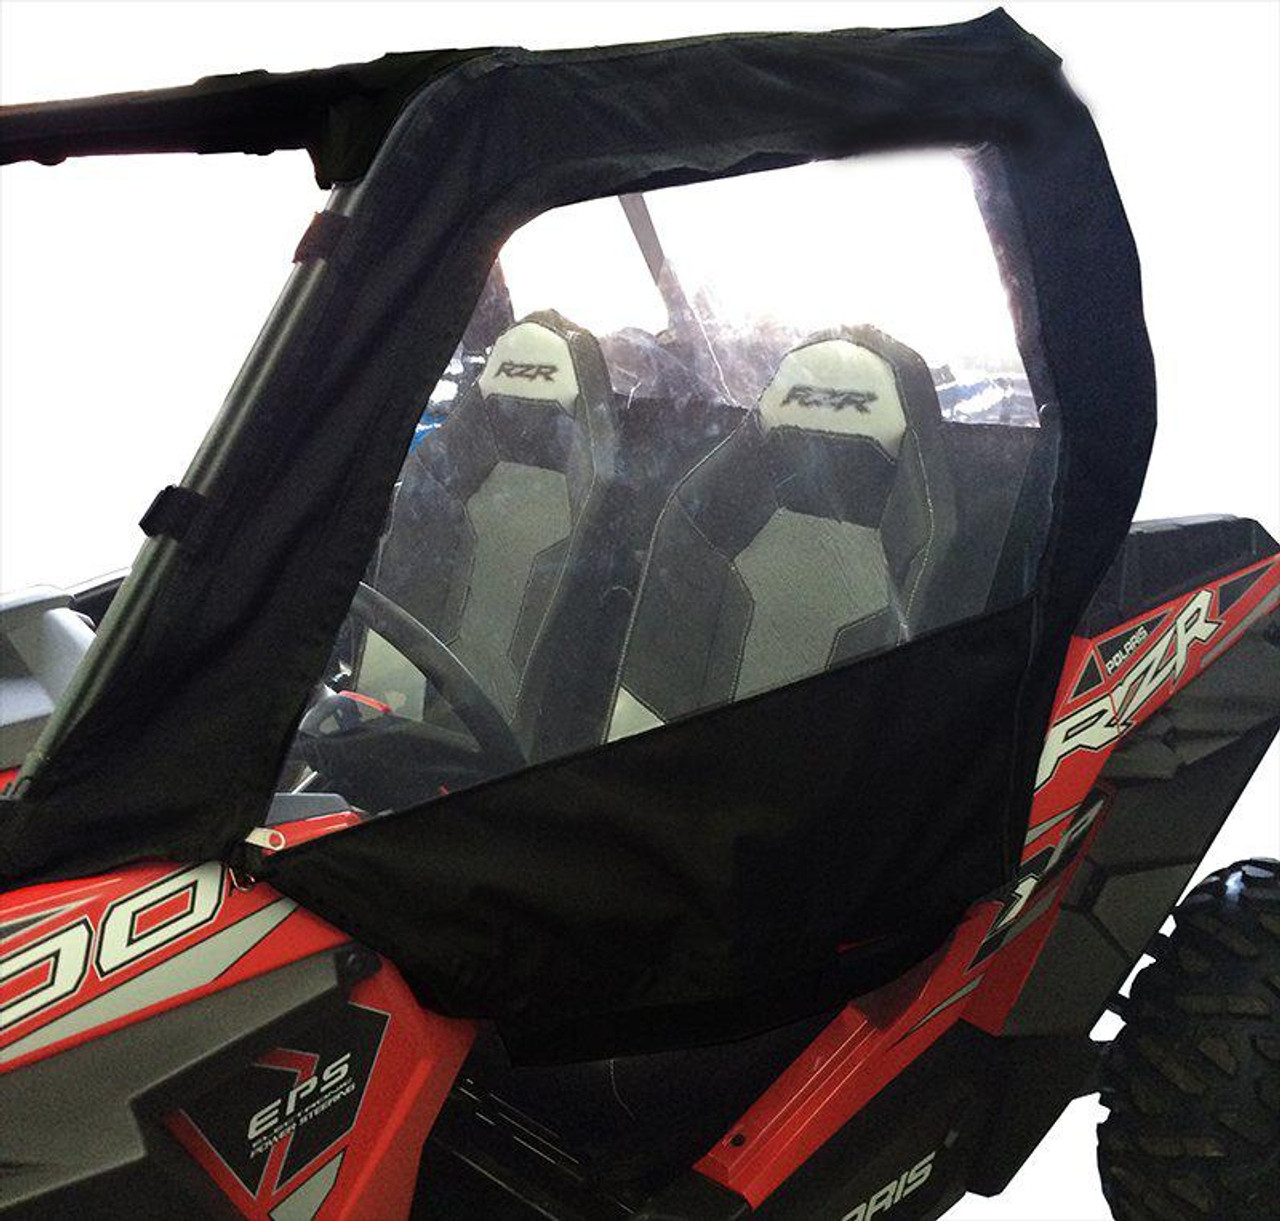 Polaris RZR 900/1000 Side Enclosures